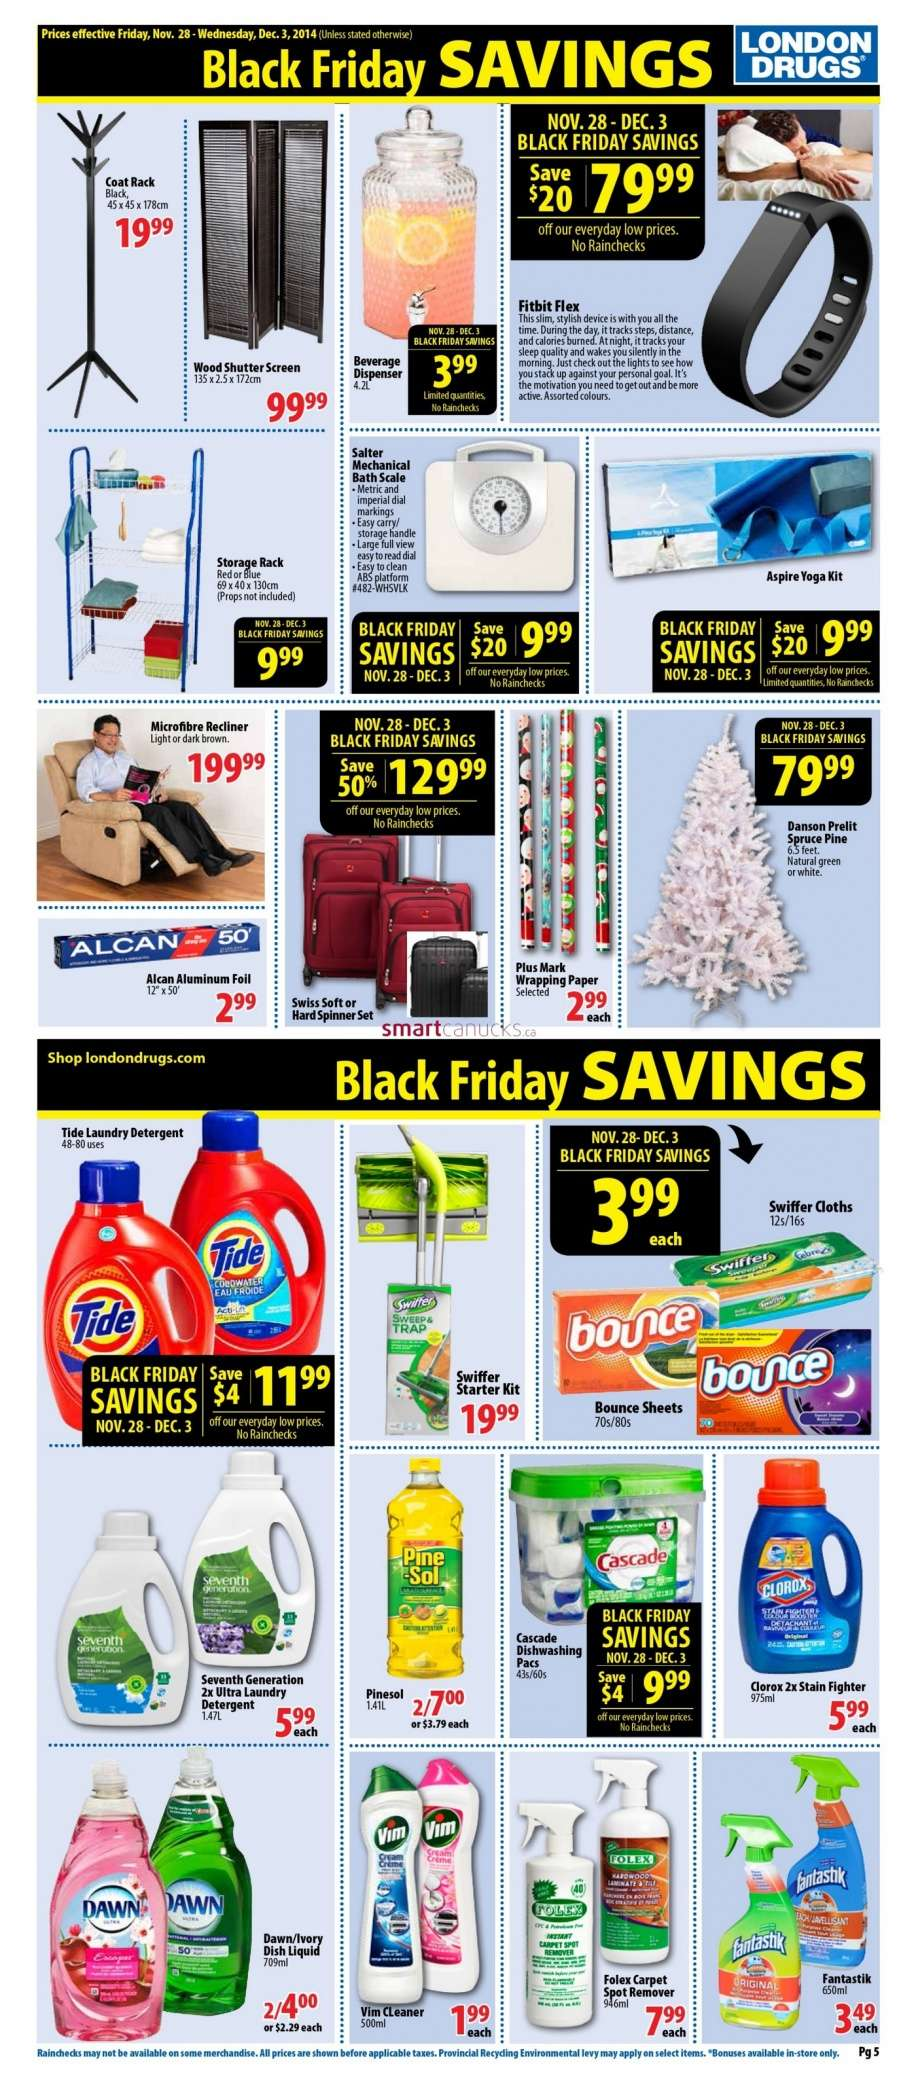 Complete coverage of Costco Black Friday Ads & Costco Black Friday deals info.